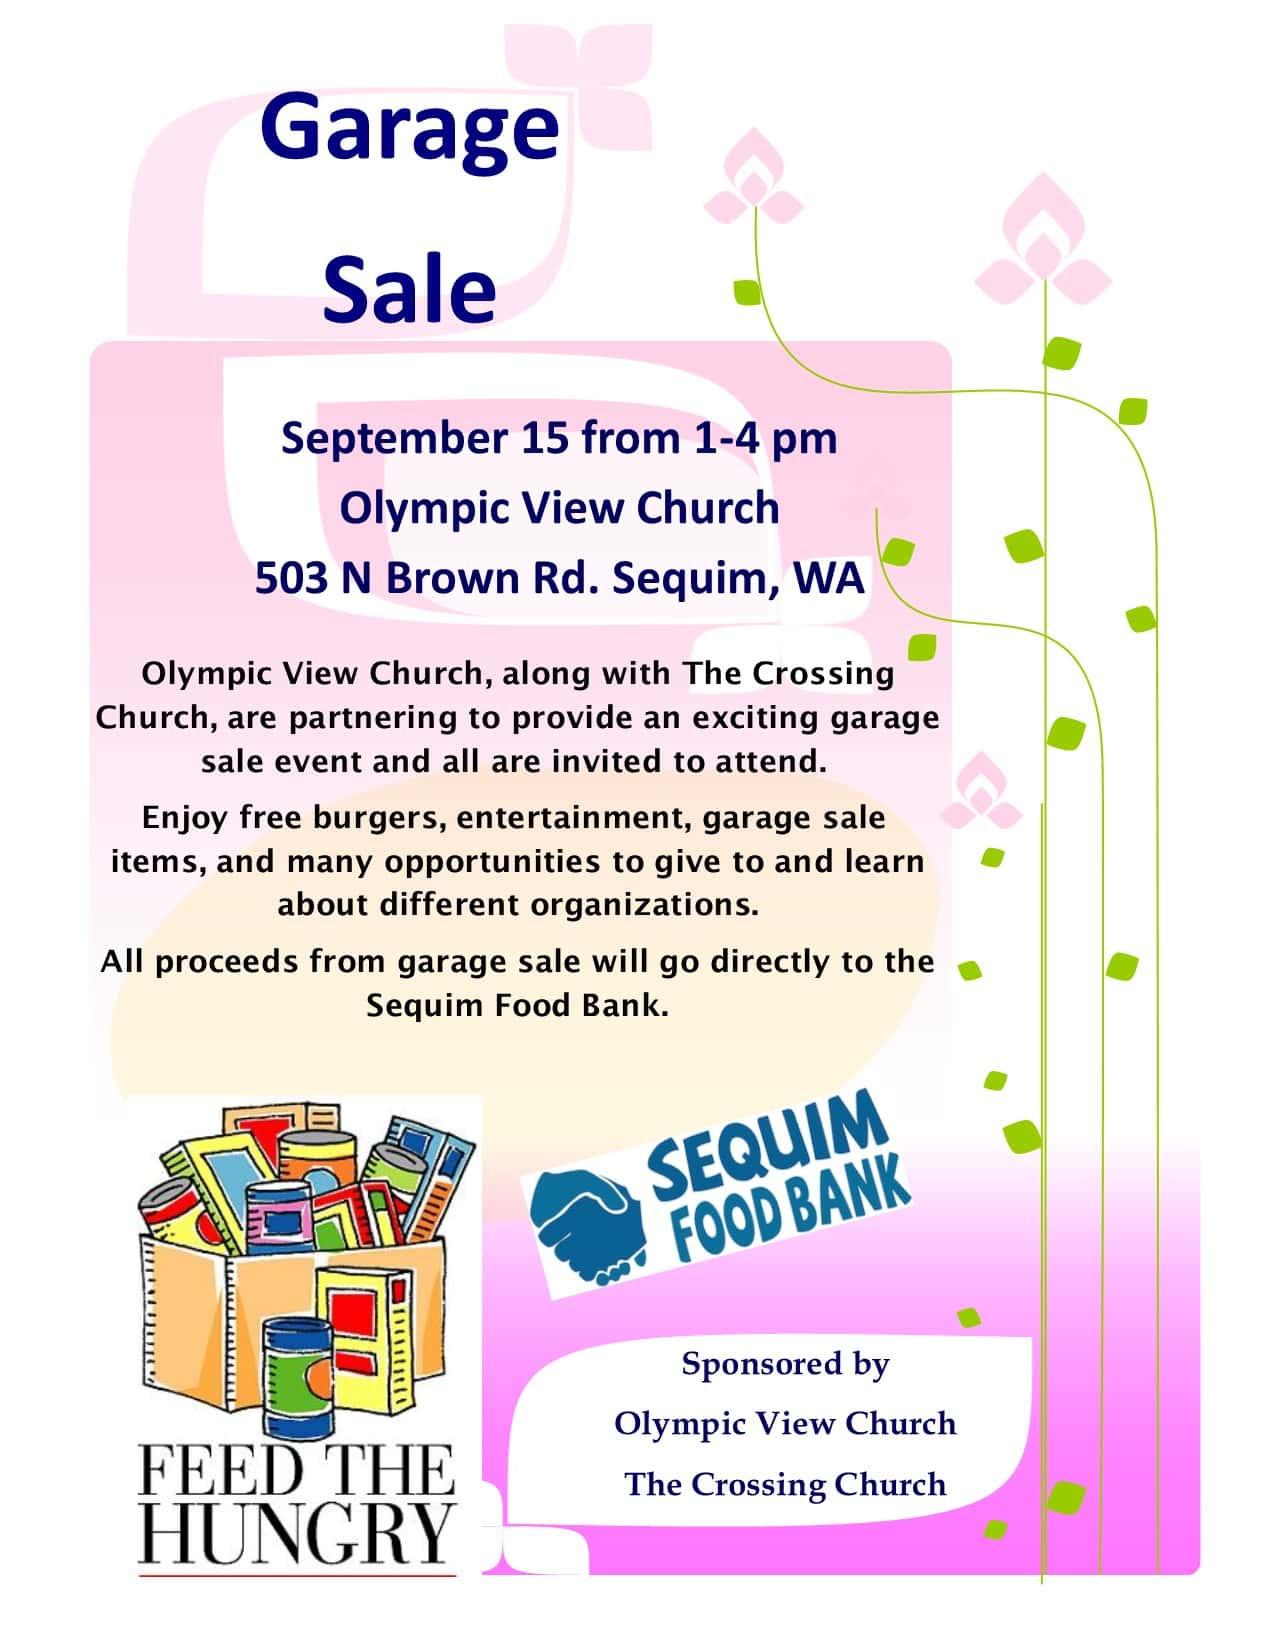 Garage Sale FundraiserMyClallamCounty com | MyClallamCounty com